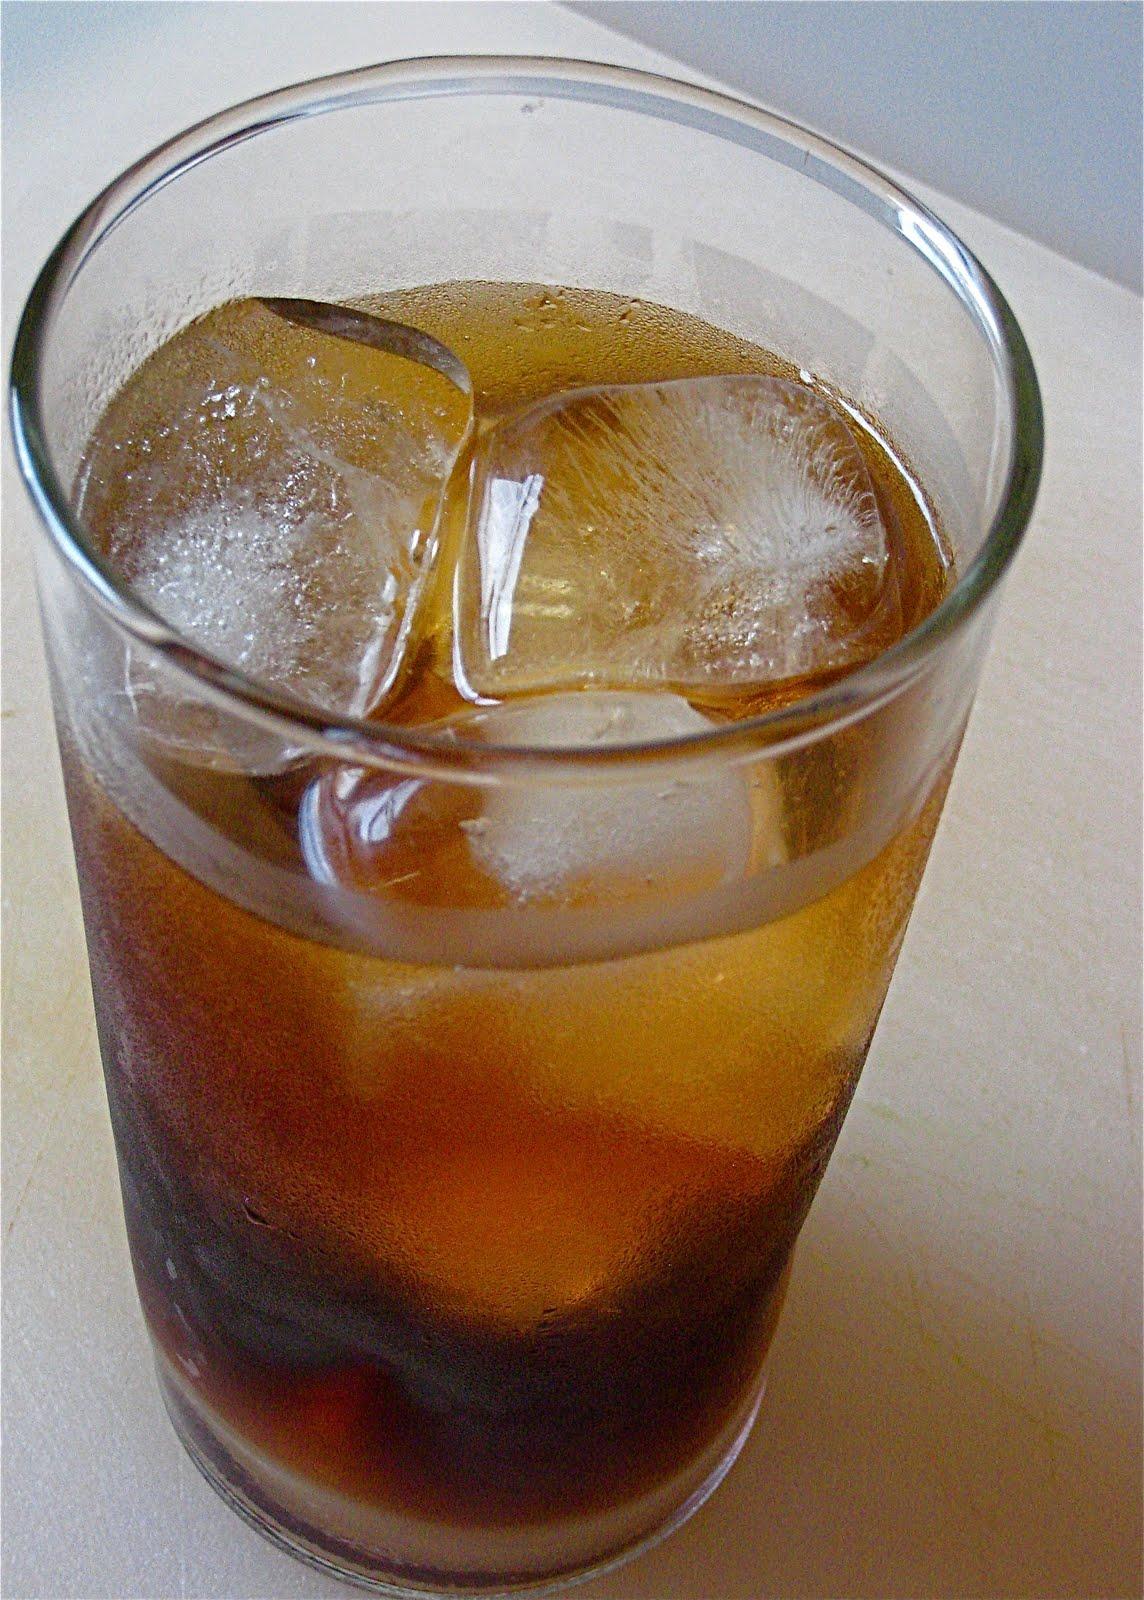 KITCHEN FIDDLER : Cold-Brewed Iced Coffee